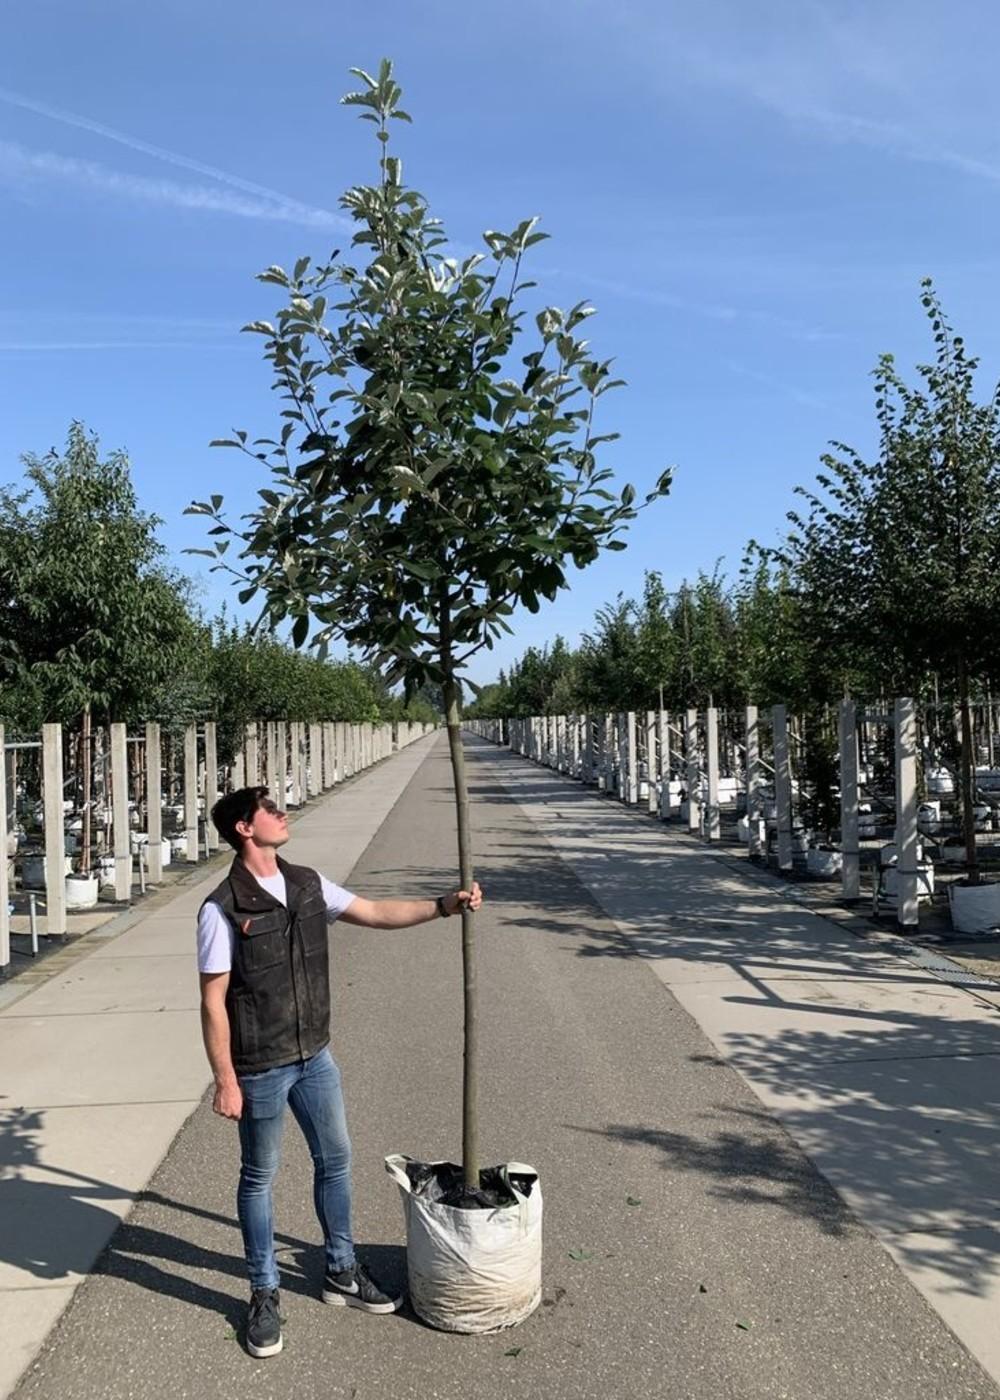 Breitblättrige Mehlbeere Henk Vink   Sorbus latifolia 'Henk Vink'